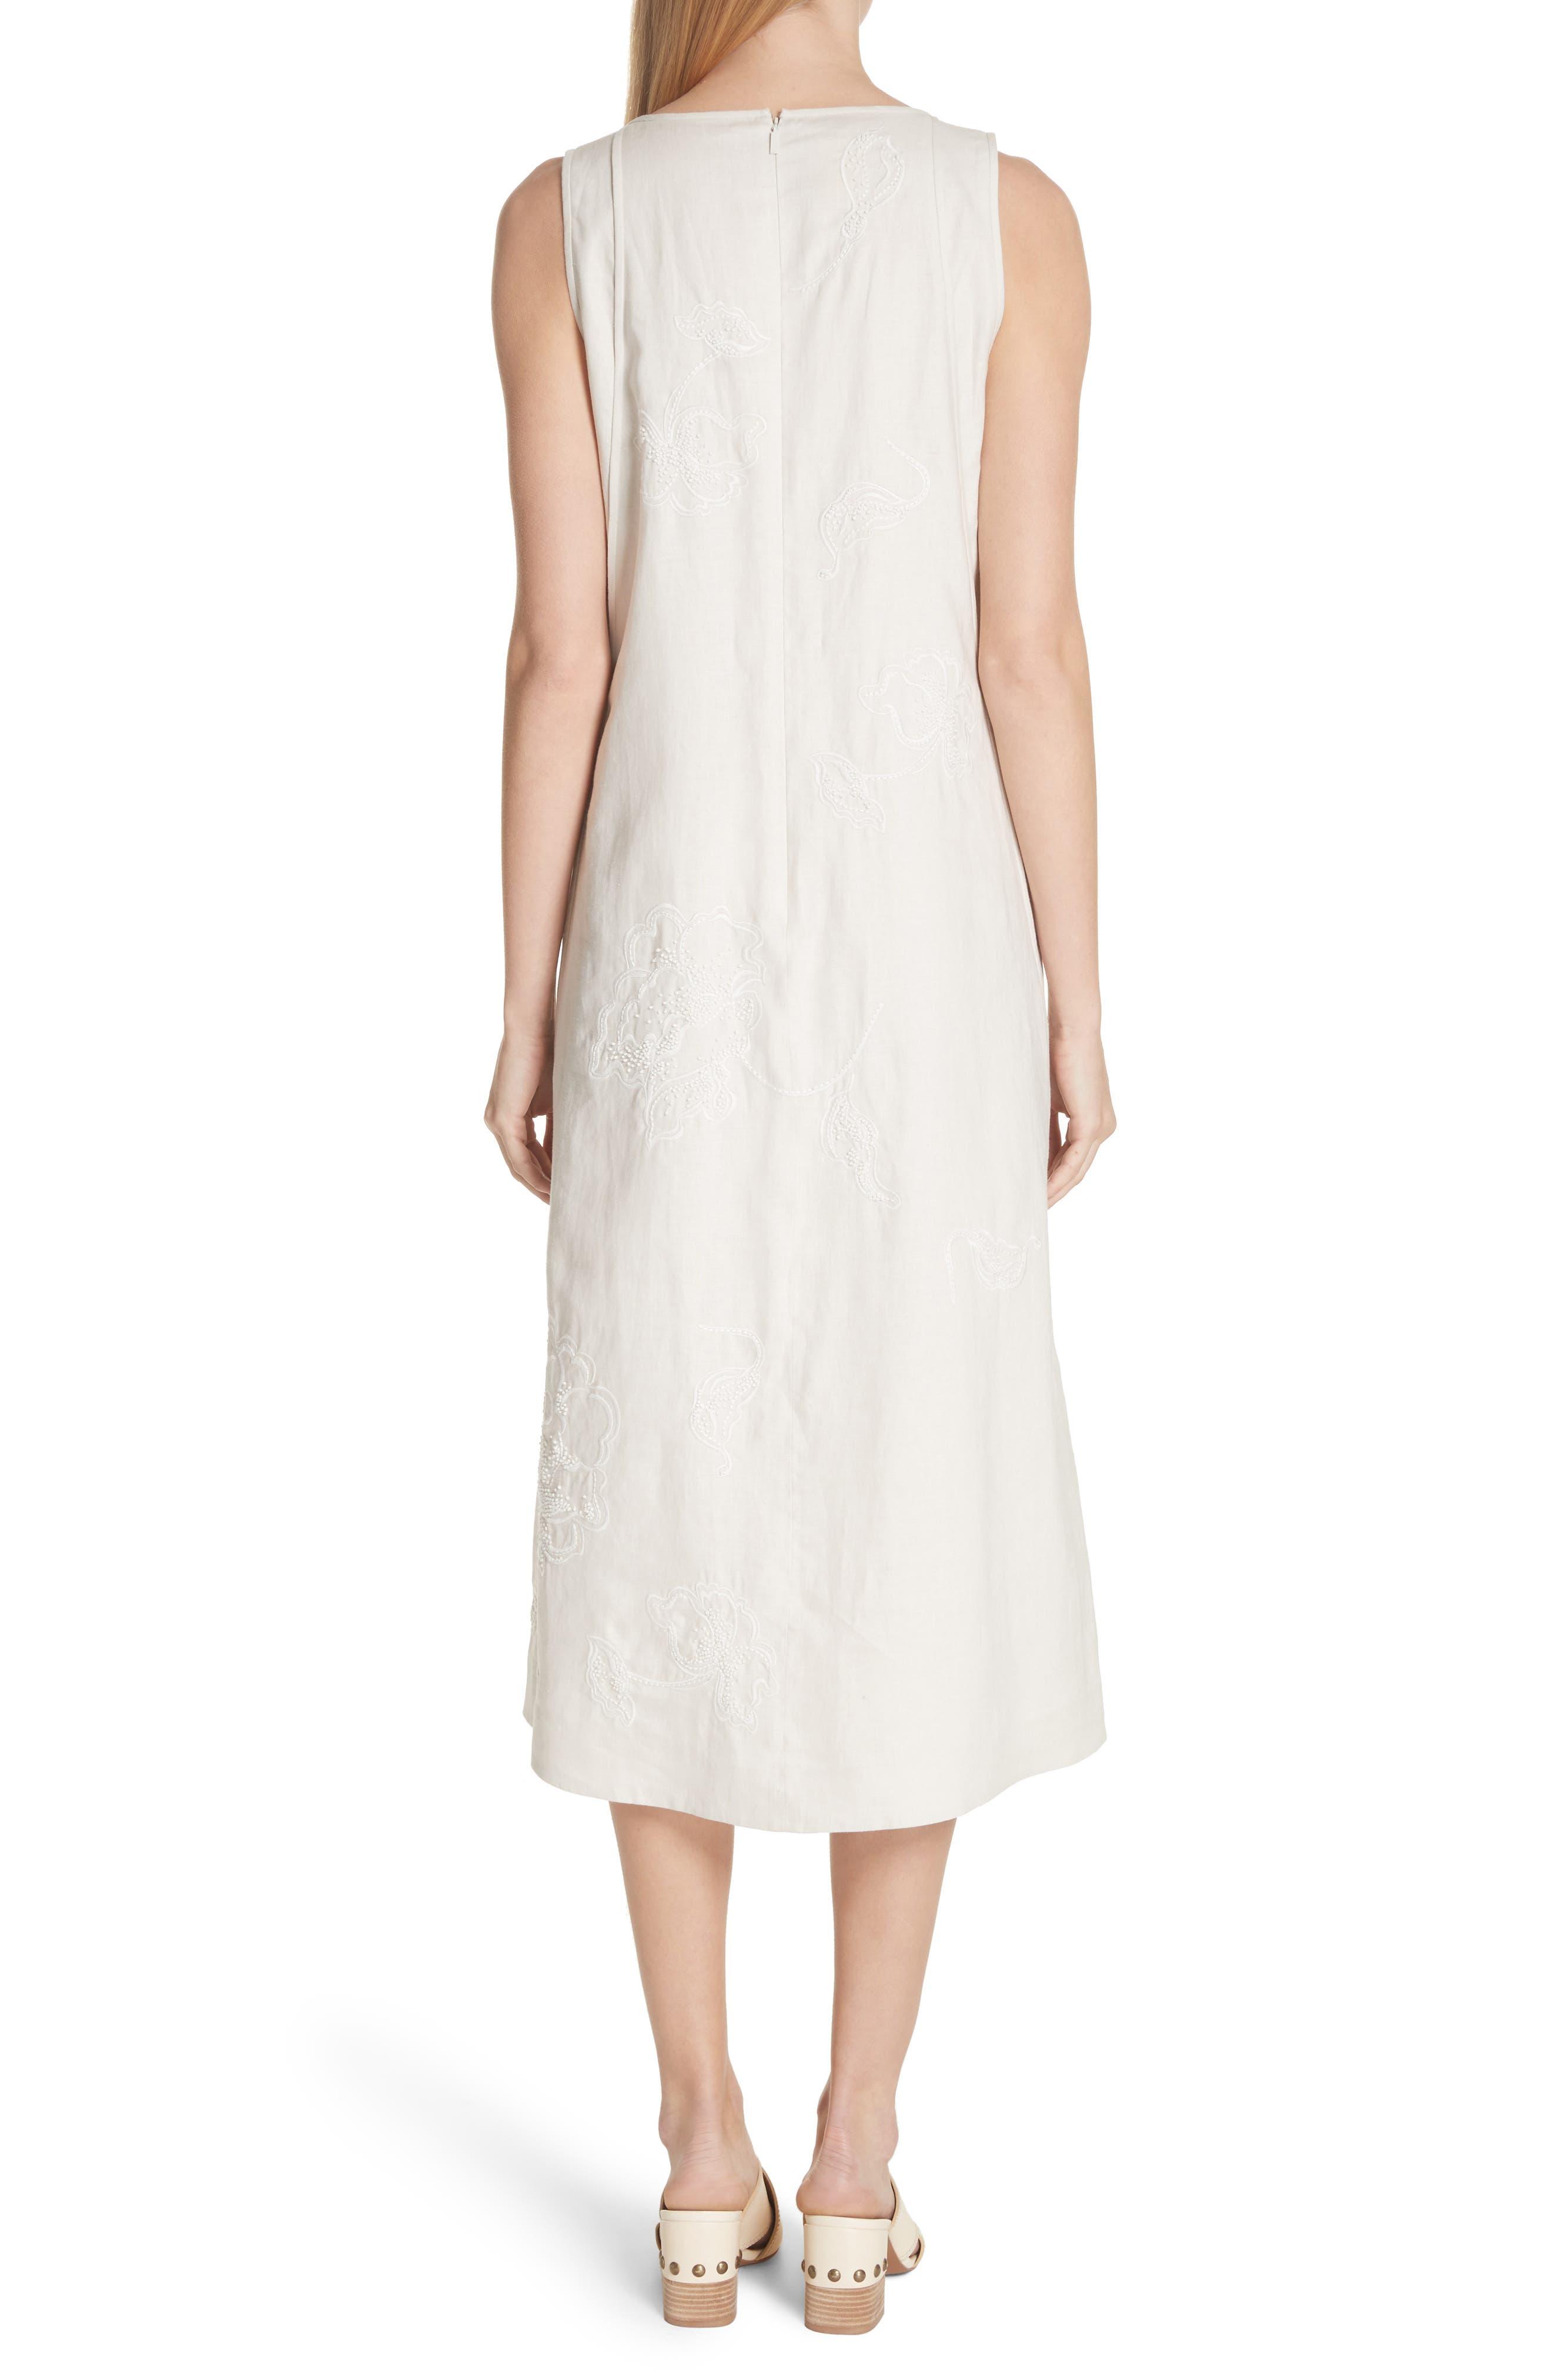 Duncan Embroidered Linen Dress,                             Alternate thumbnail 2, color,                             252